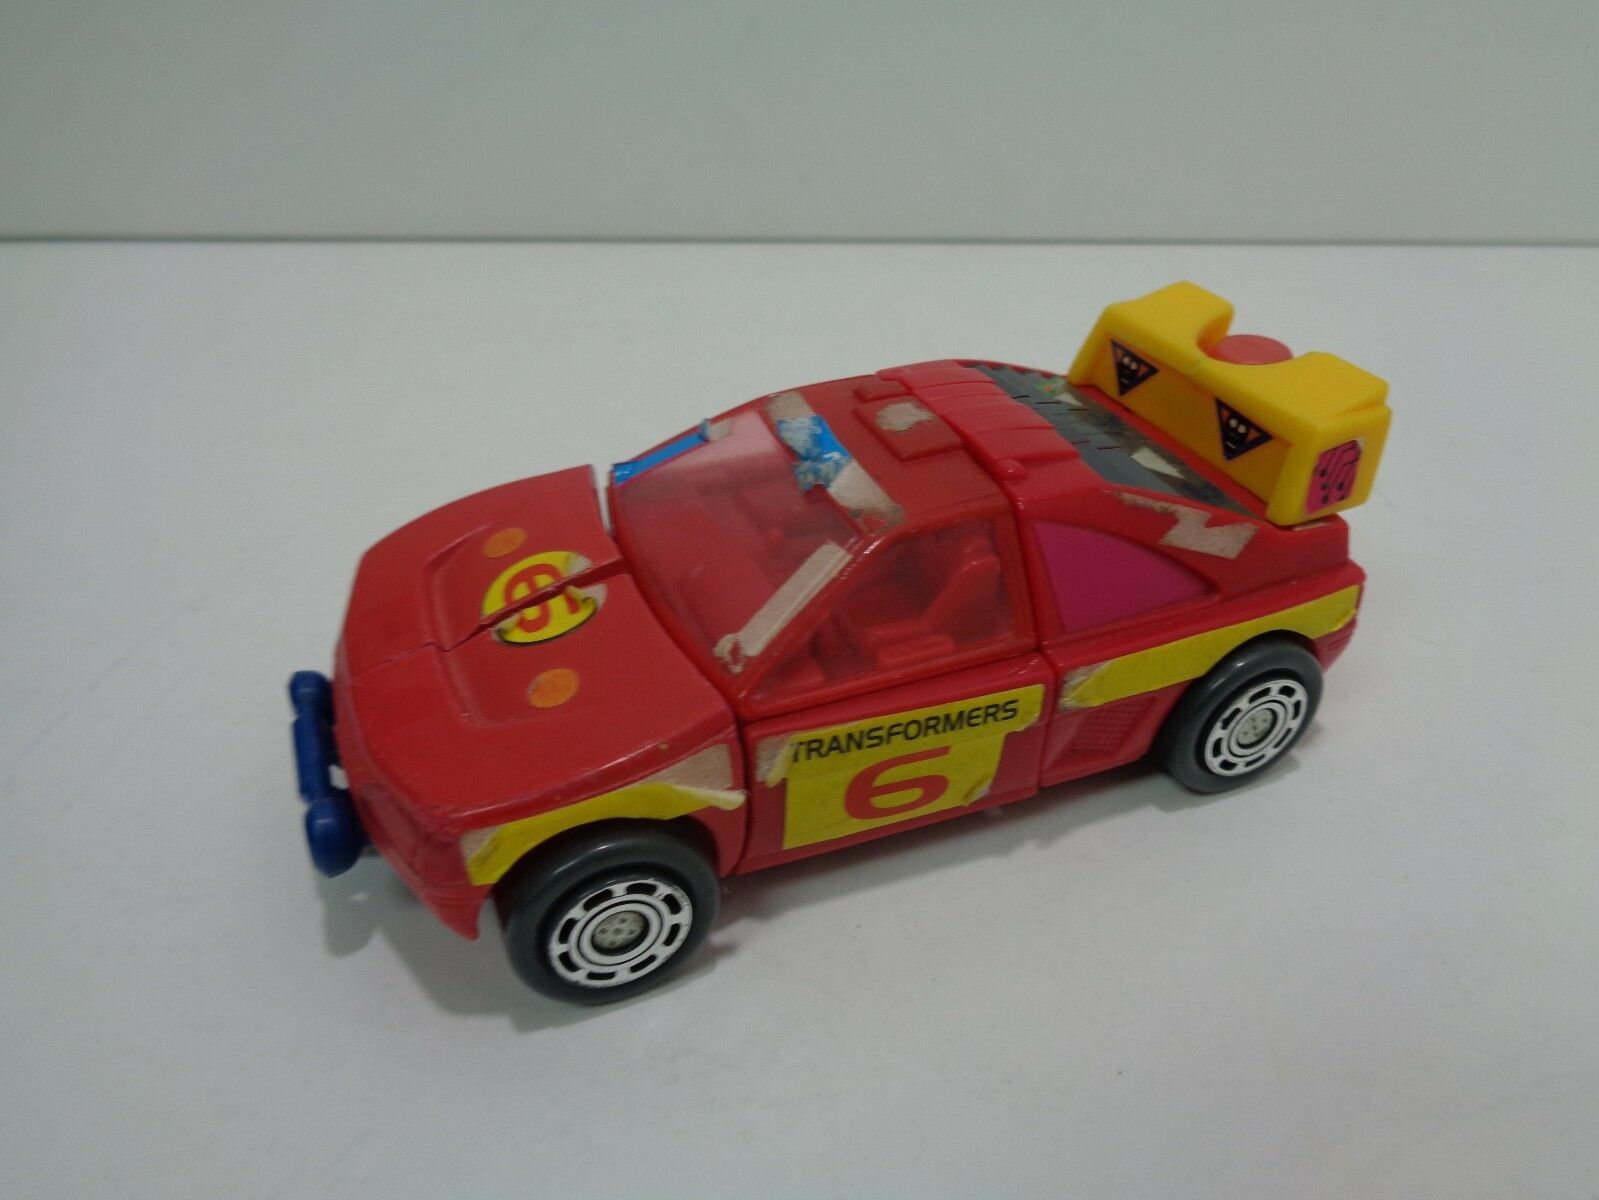 Transformers JETSTORM Generation 1 (Europe) - Complete Figure - 1993 Hasbro